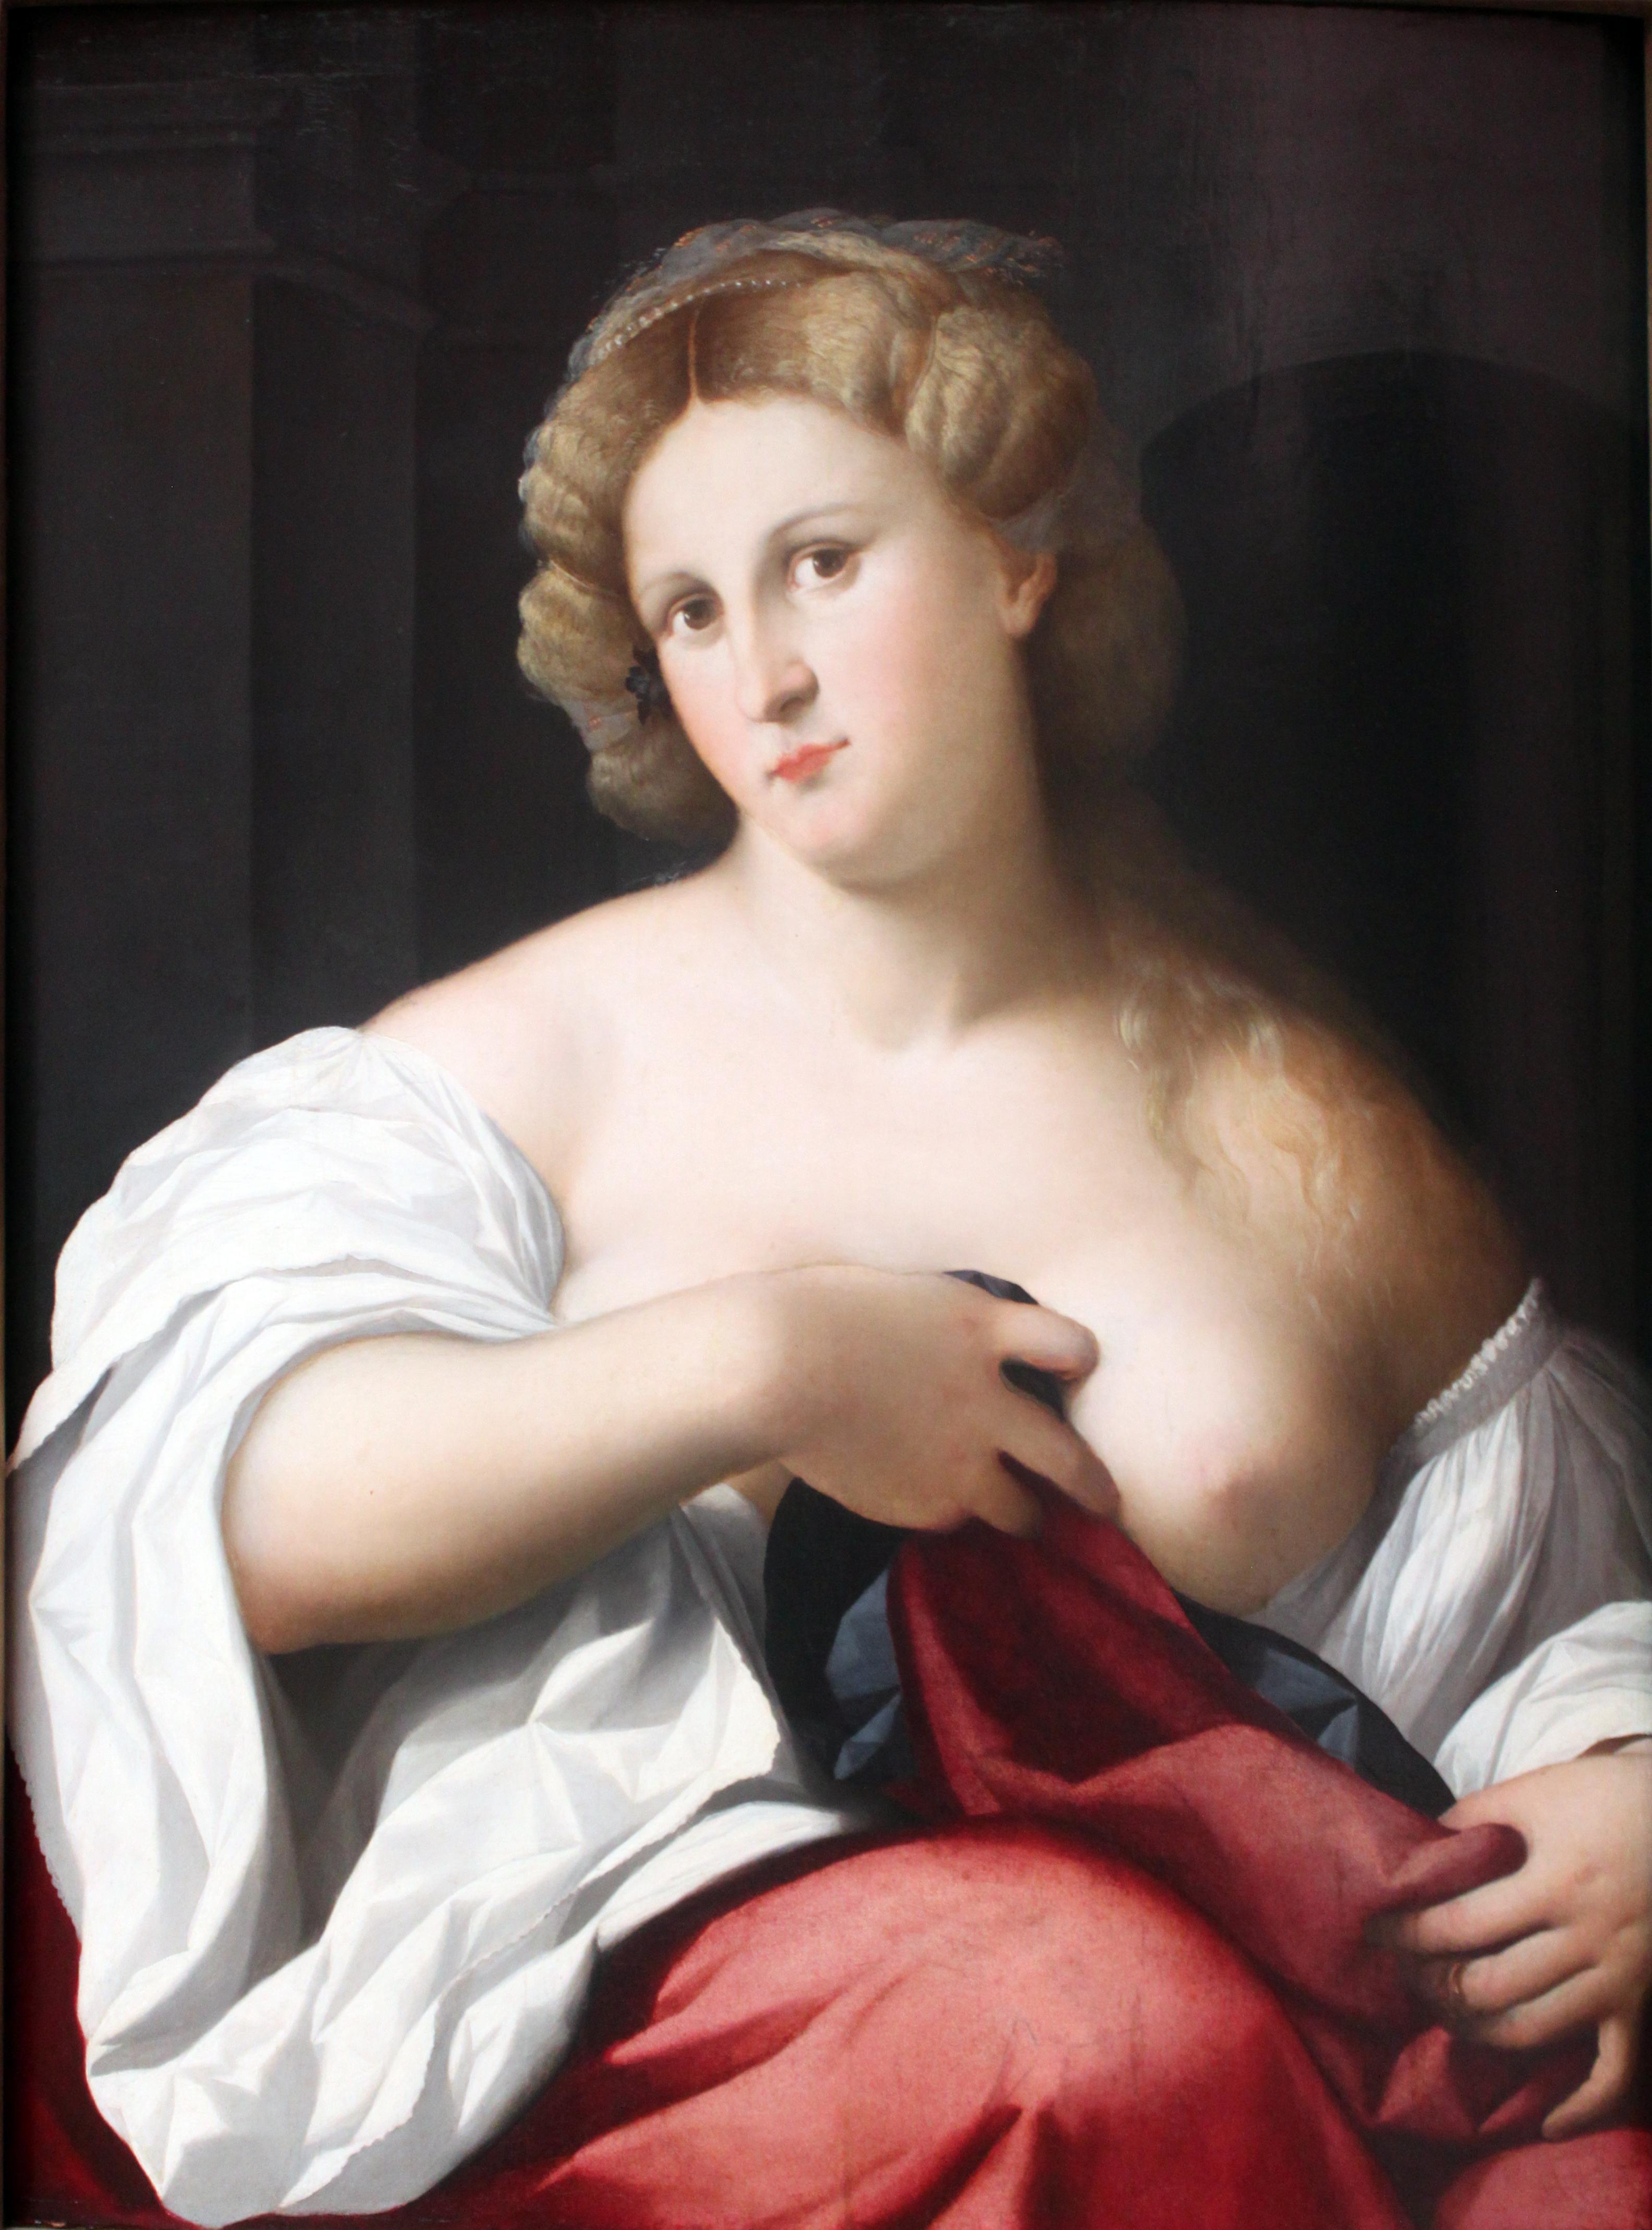 Renaissance bare erotic image